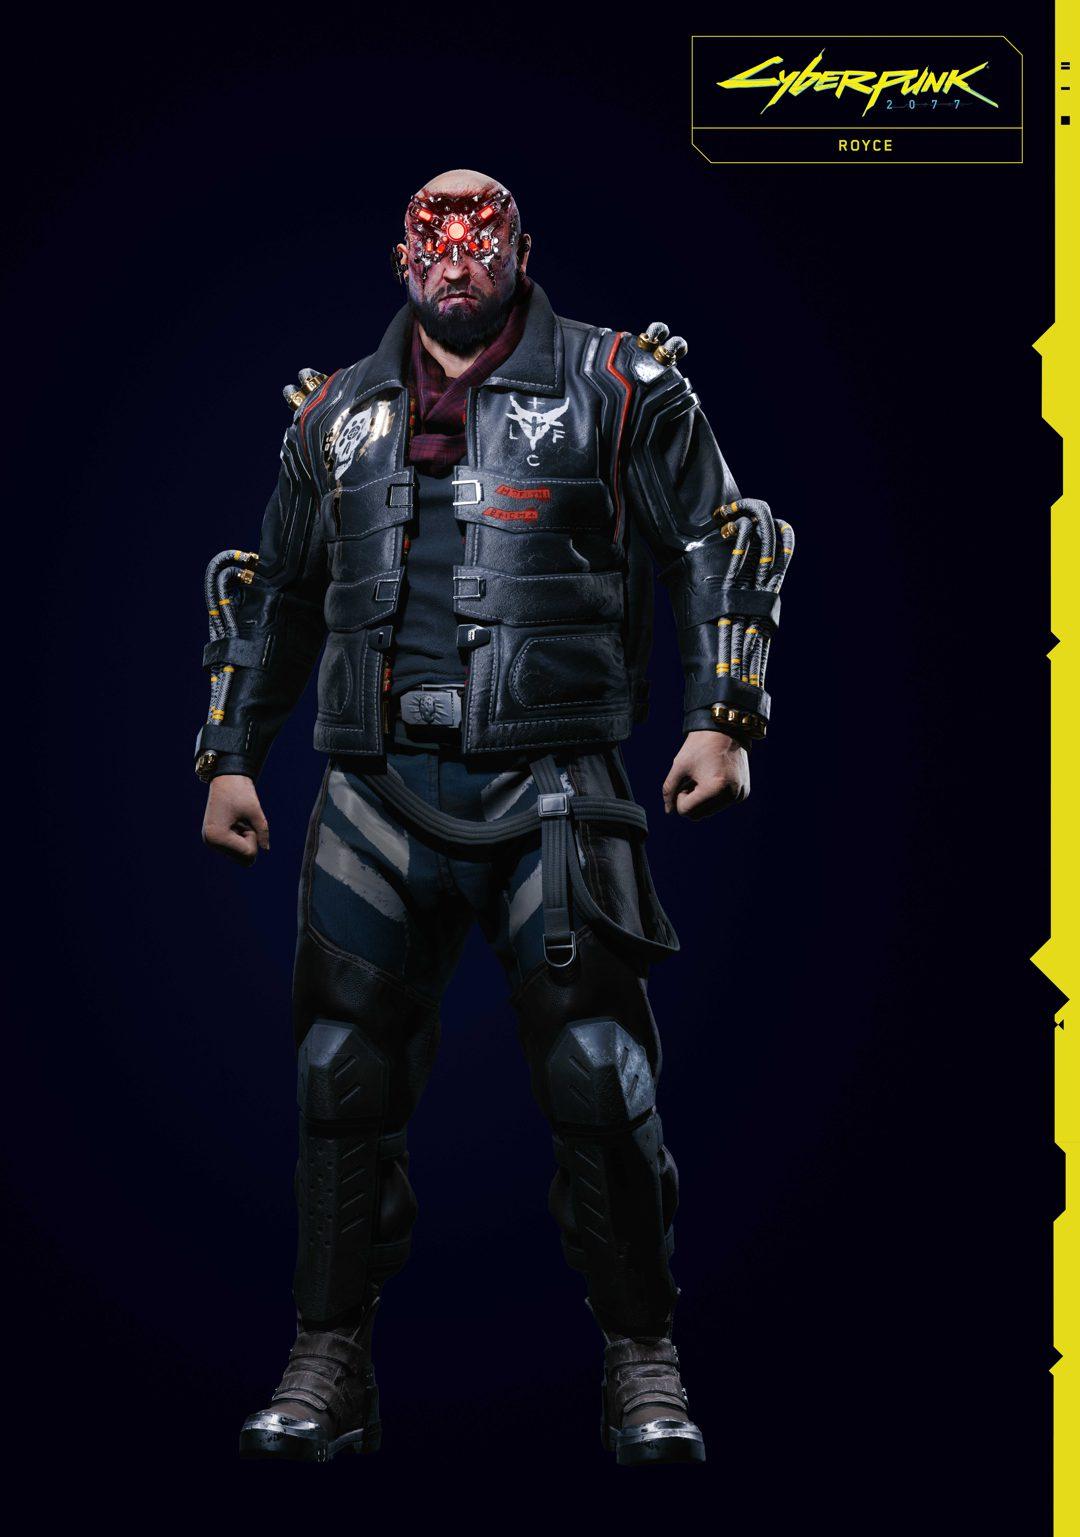 Cyberpunk 2077 Simon Randall Royce Kazuliski in 2020